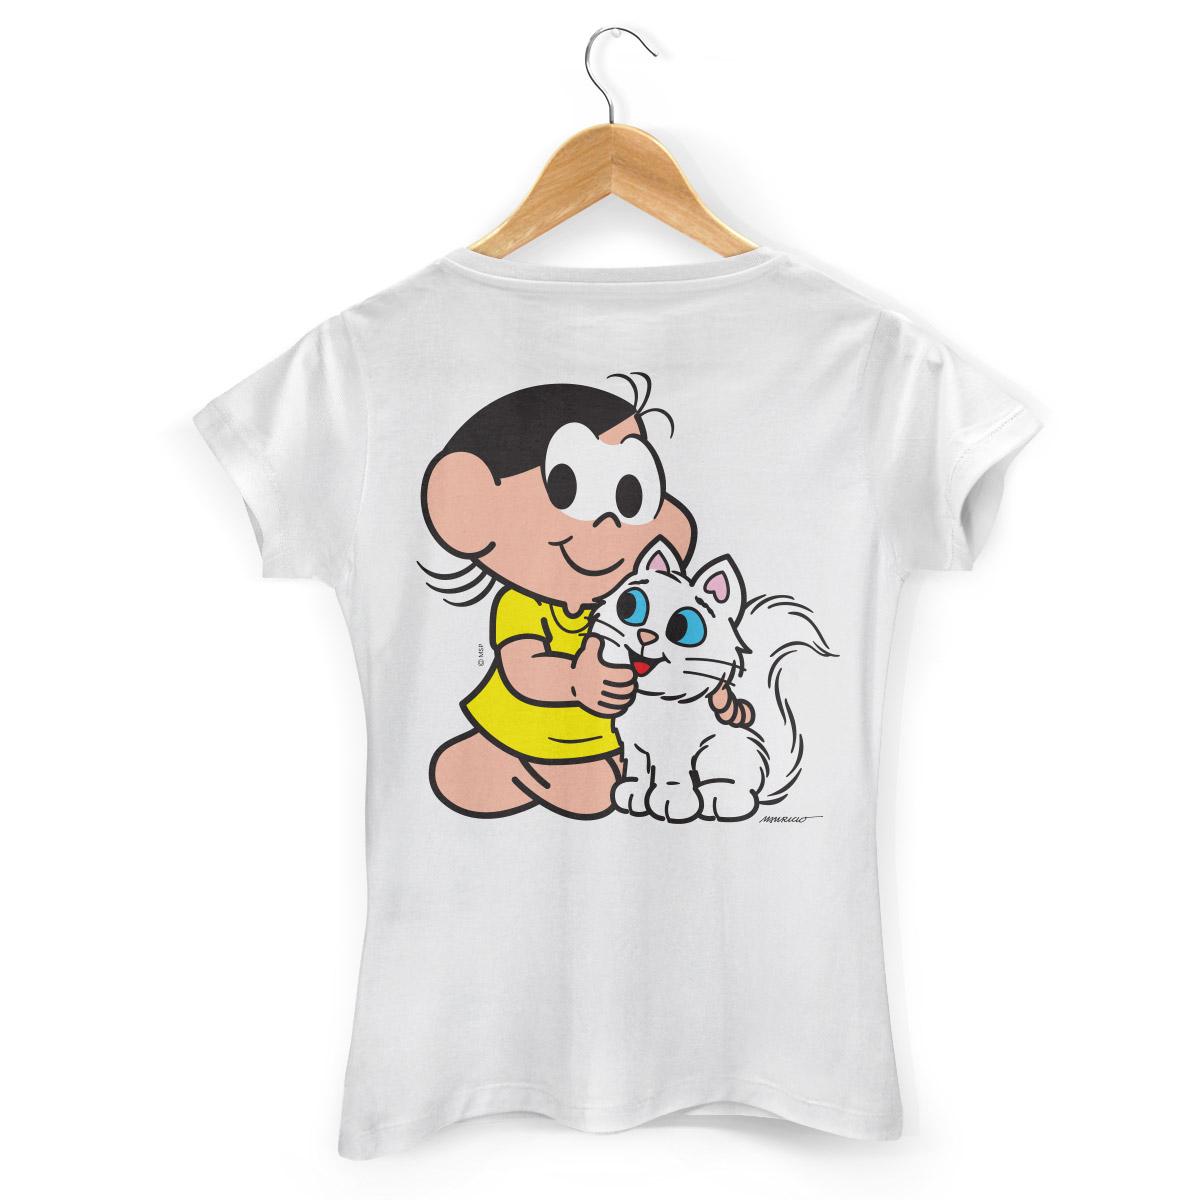 Camiseta Feminina Turma da Mônica Kids Olhões Mingau